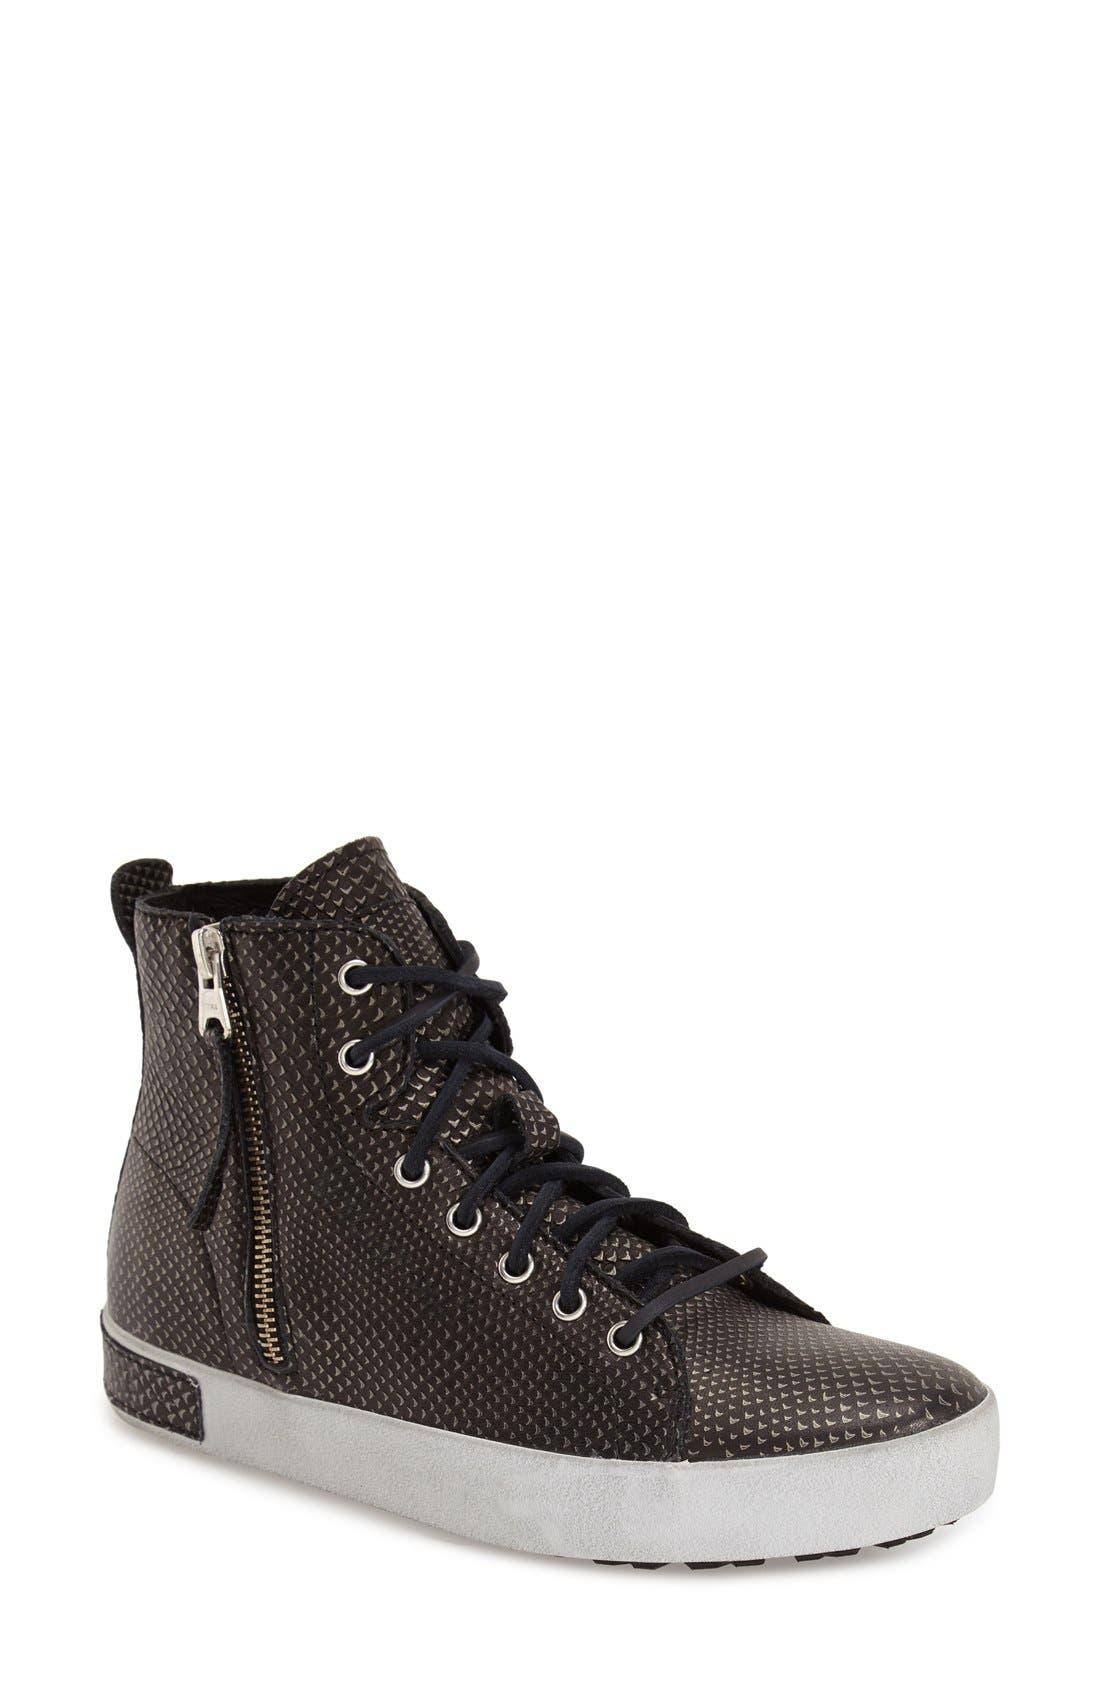 Main Image - Blackstone 'KL57' High Top Sneaker (Women)